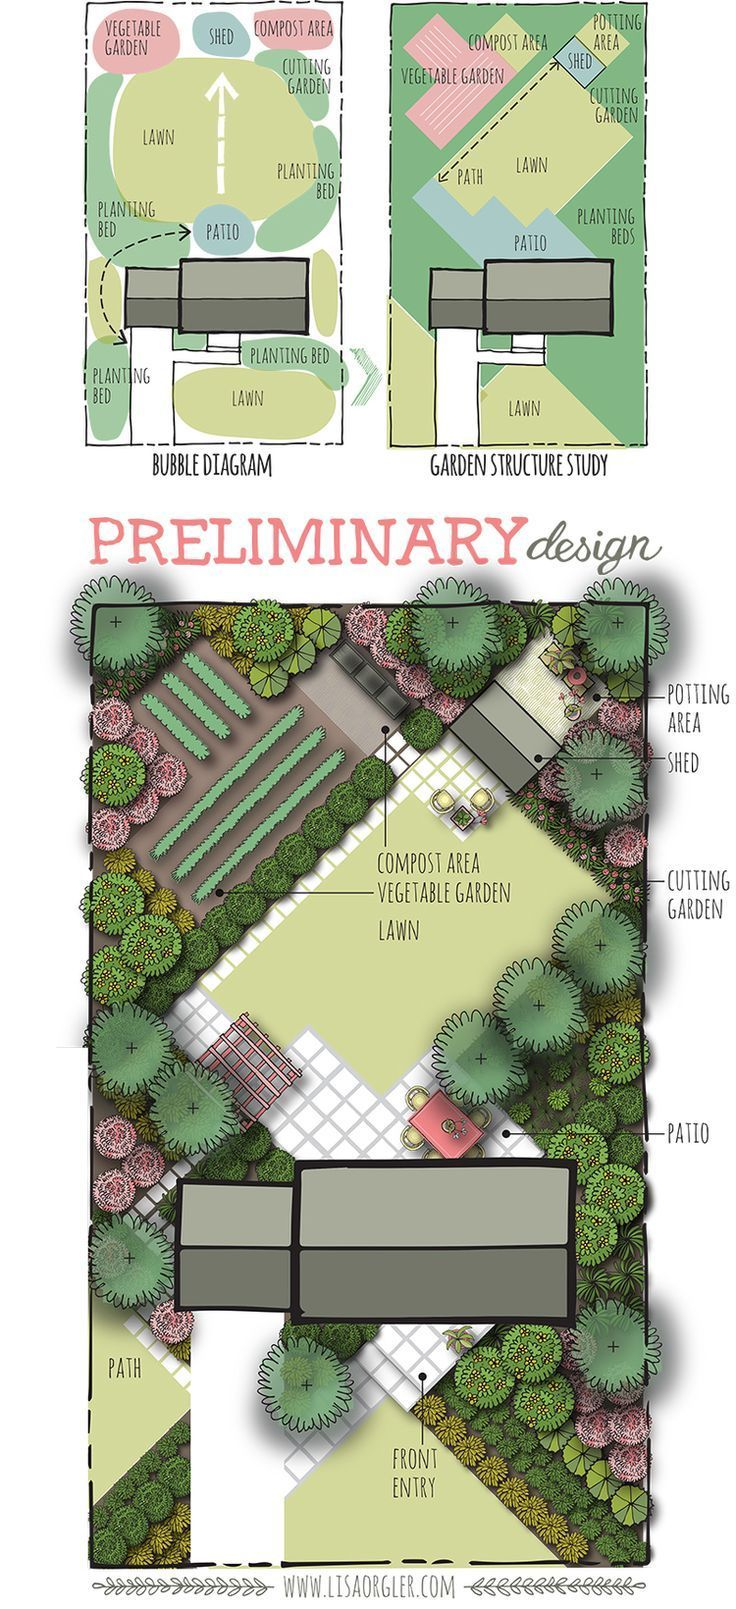 Iowan Lisa Orgler 39 S Website 39 S Chock Full Of Beautiful Garden Designs